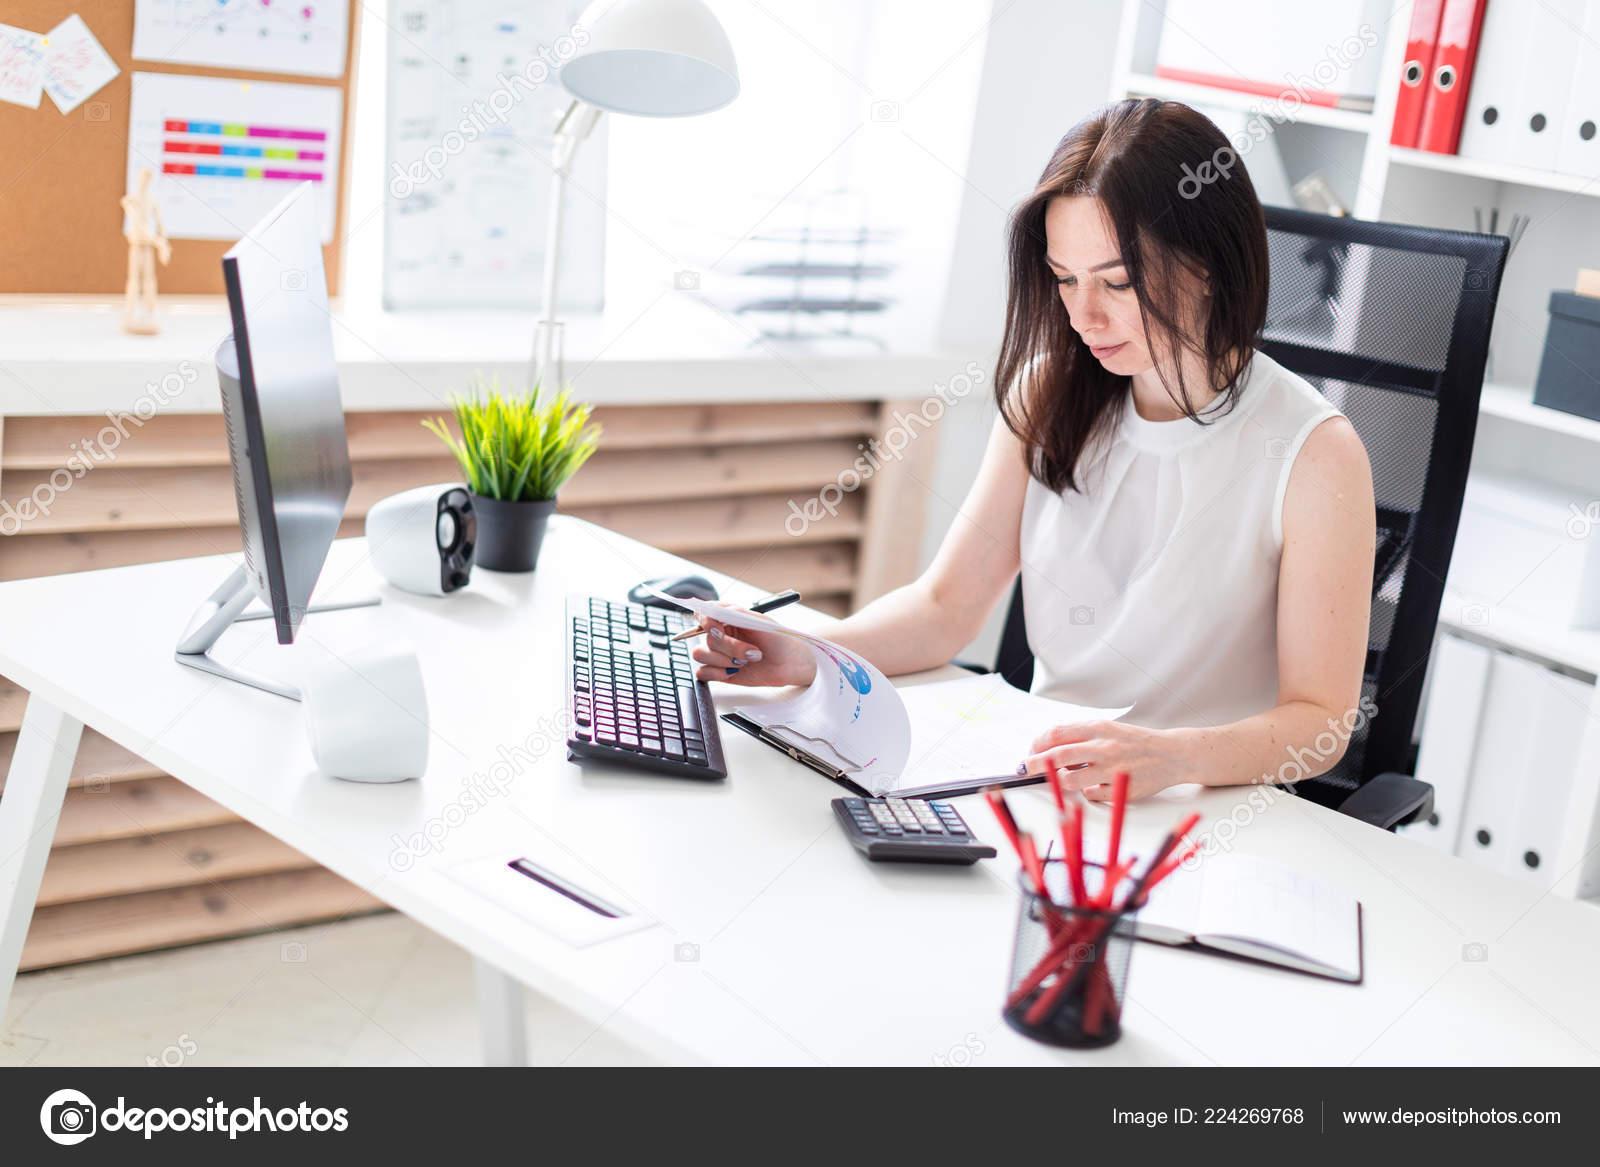 6afdfa5fcb14 Όμορφη νεαρή κοπέλα που εργάζεται σε ένα φωτεινό γραφείο. Νεαρή κοπέλα σε λευκή  μπλούζα και μαύρη φούστα. φωτογραφία